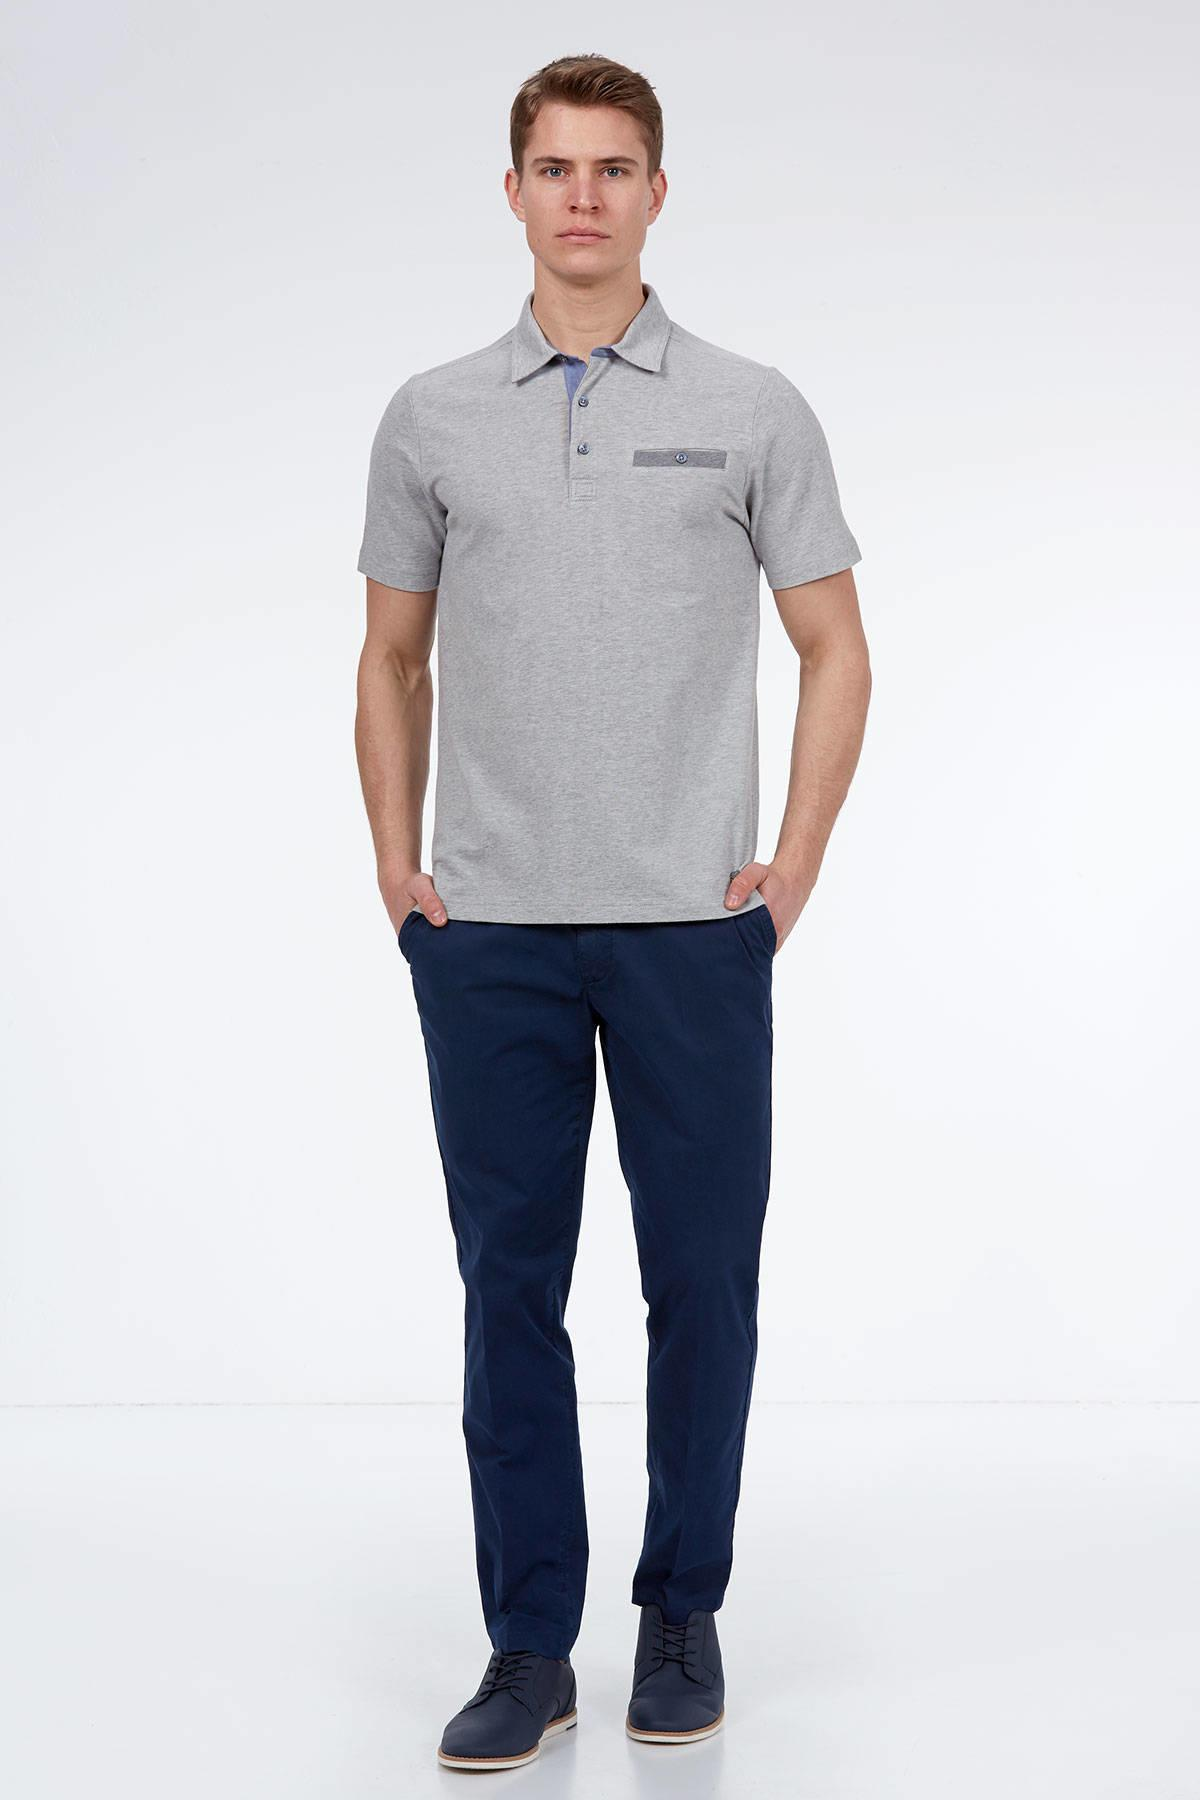 Gri Polo Yaka Pamuk T-Shirt